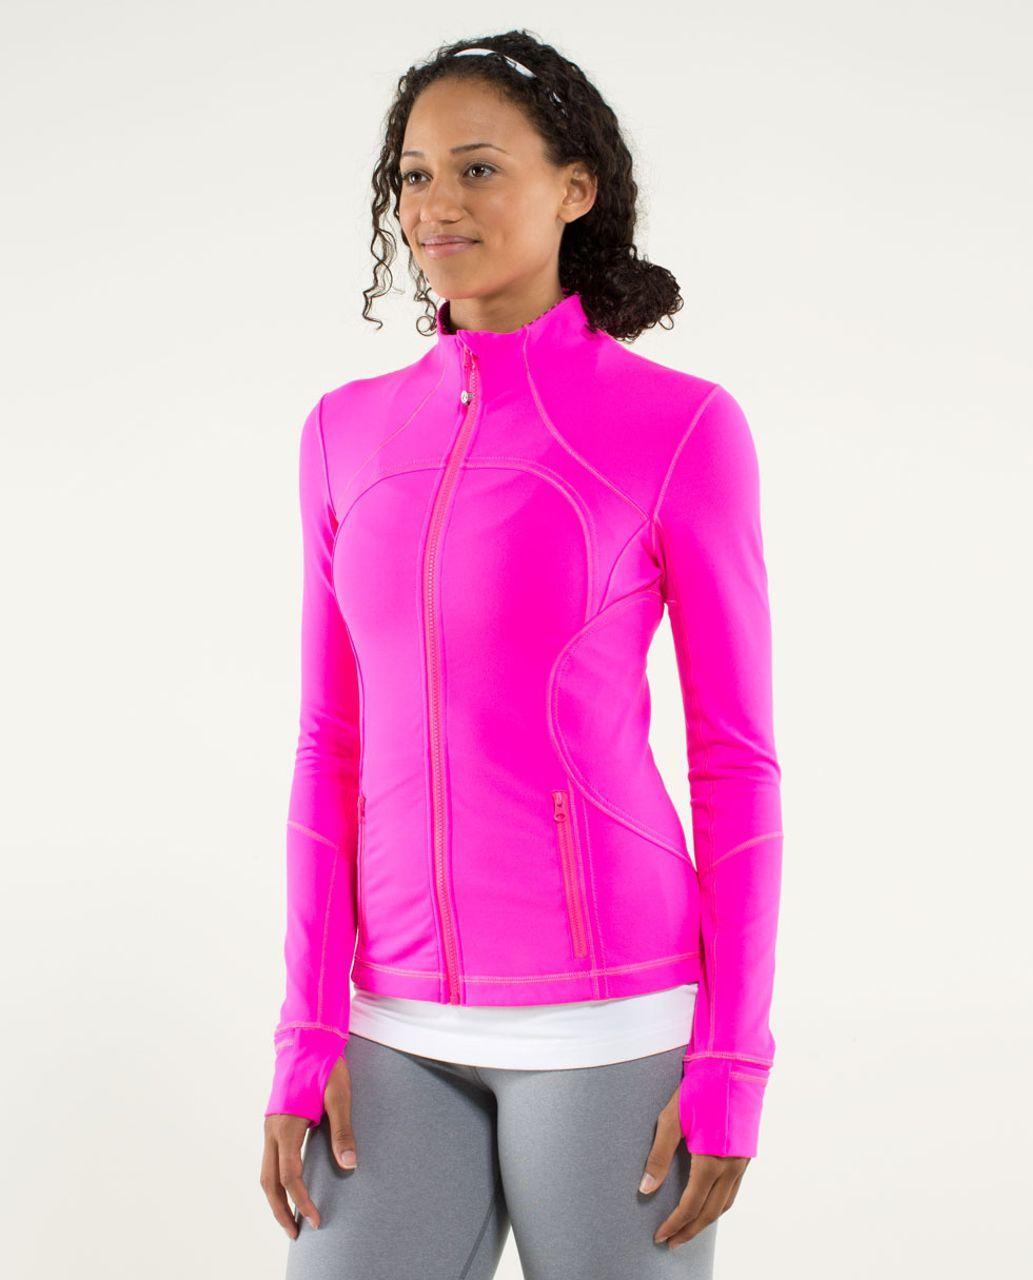 Lululemon Forme Jacket *Cuffins - Raspberry Glo Light / Hyper Stripe Raspberry Glo Light